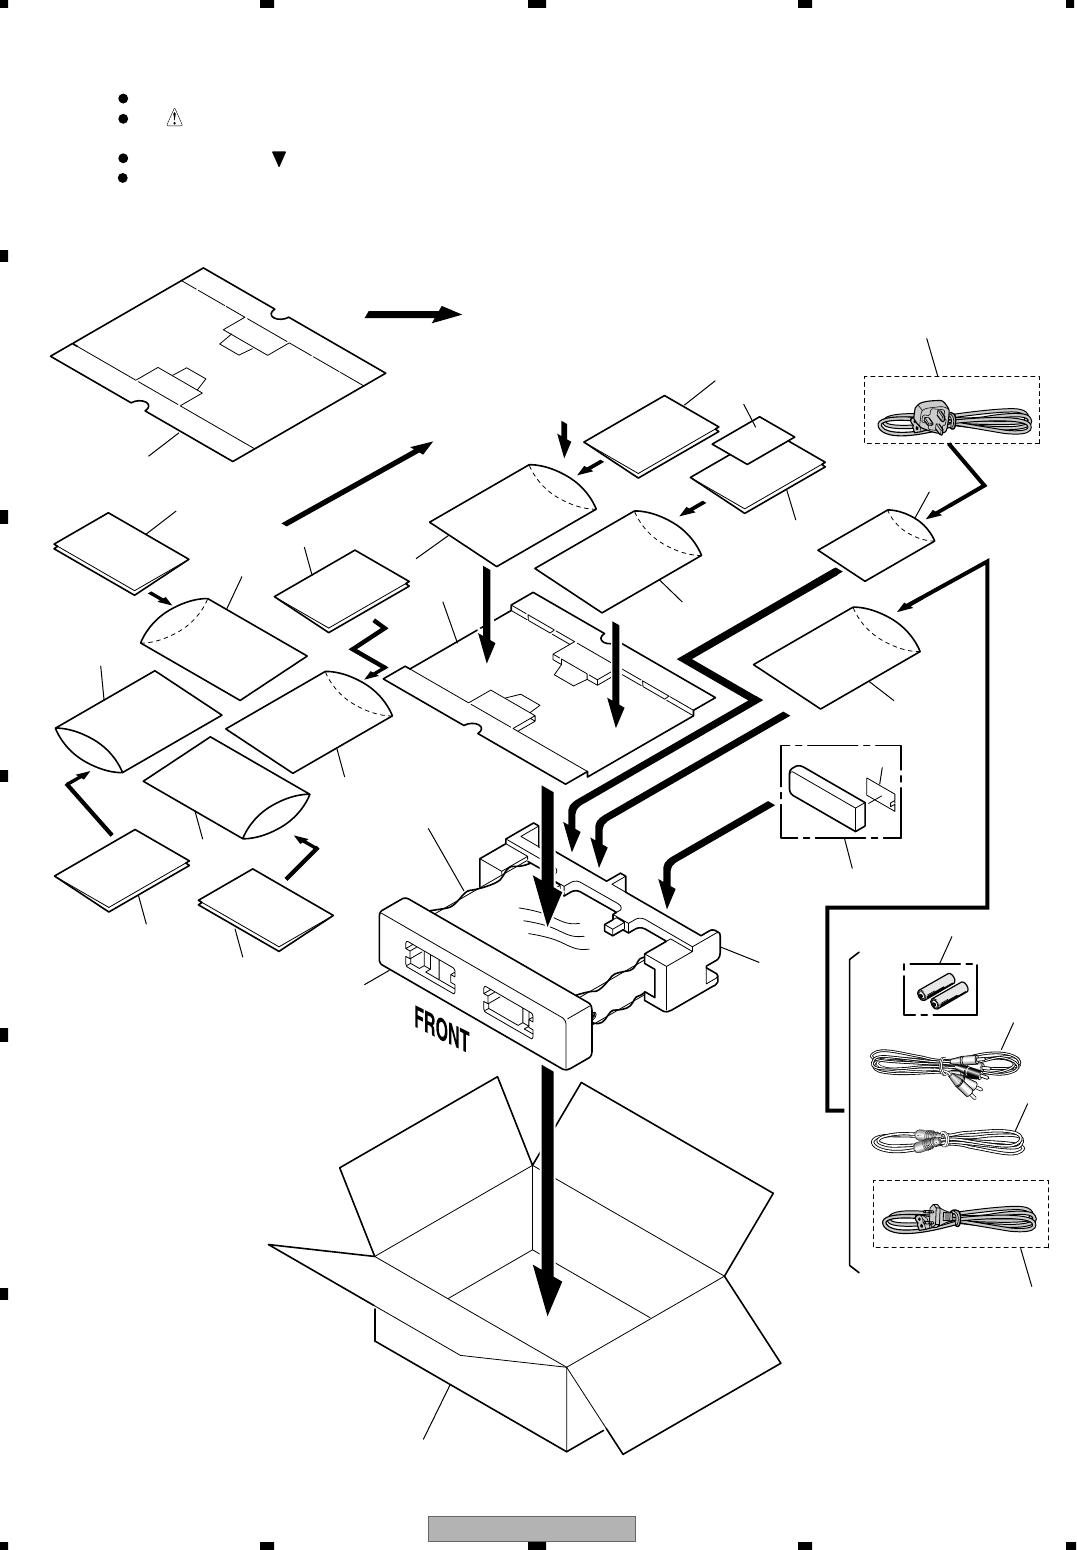 p90 wiring diagram for sg wiring diagram database Lace Sensor Strat Wiring r2843 nn dvr 3100 s rrv2843 dual humbucker wiring dvr 3100 s